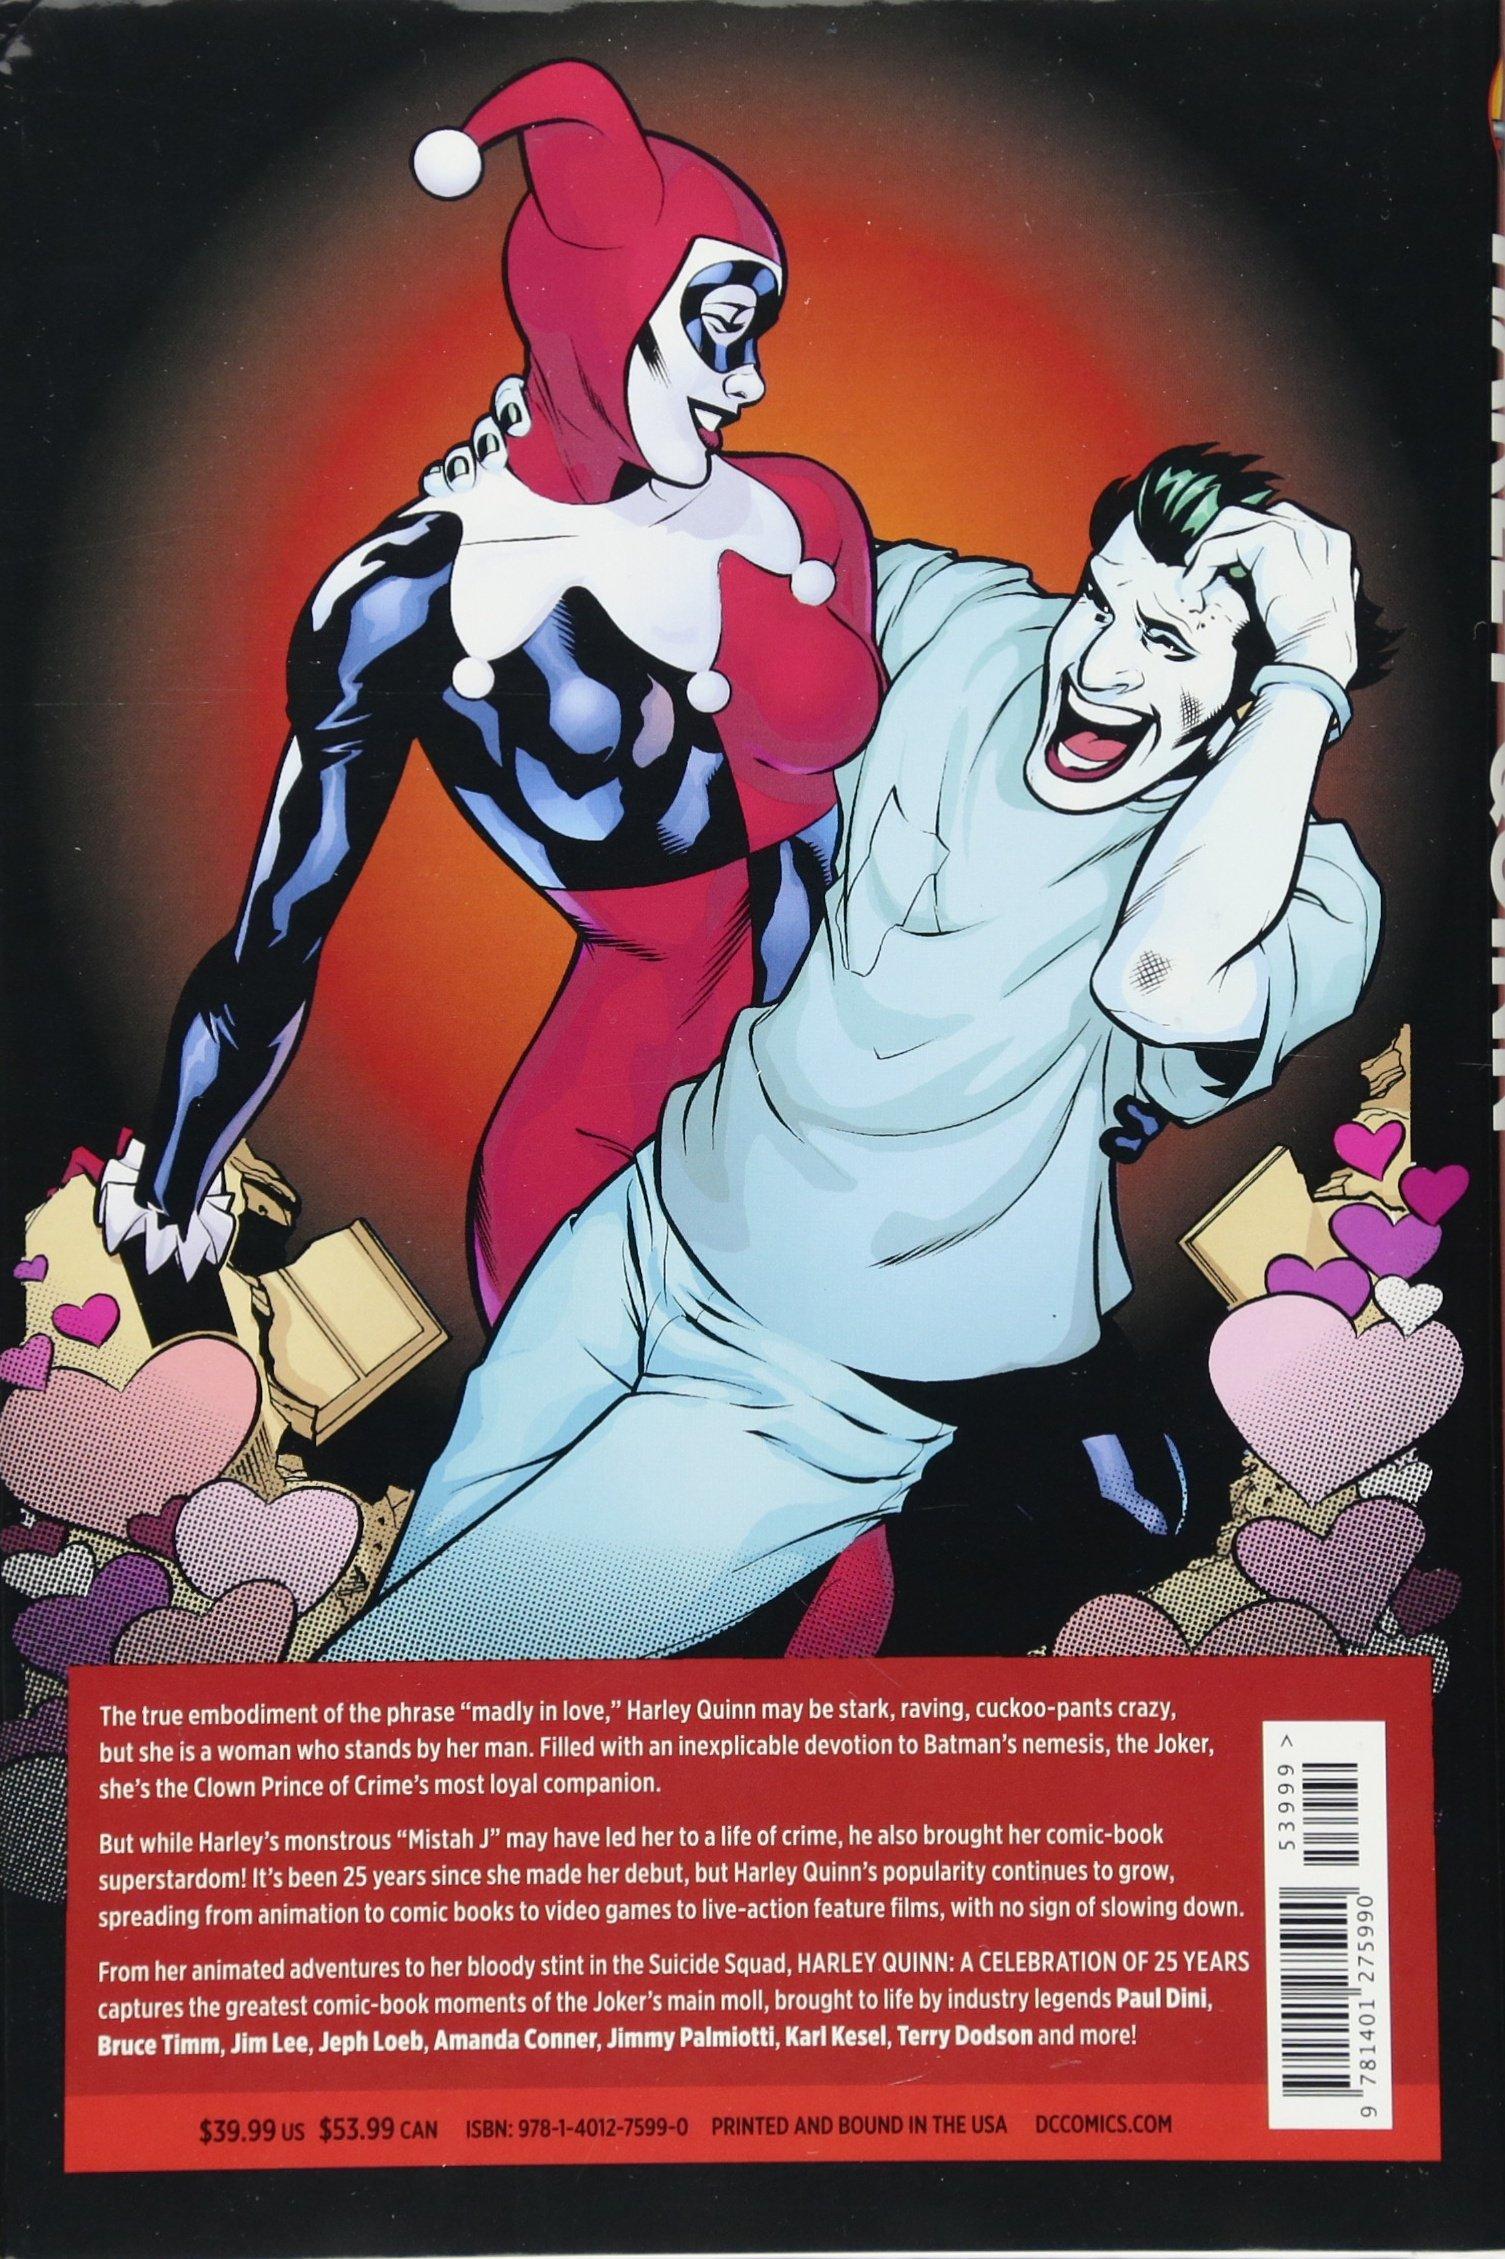 Joker and harley quinn bruce timm